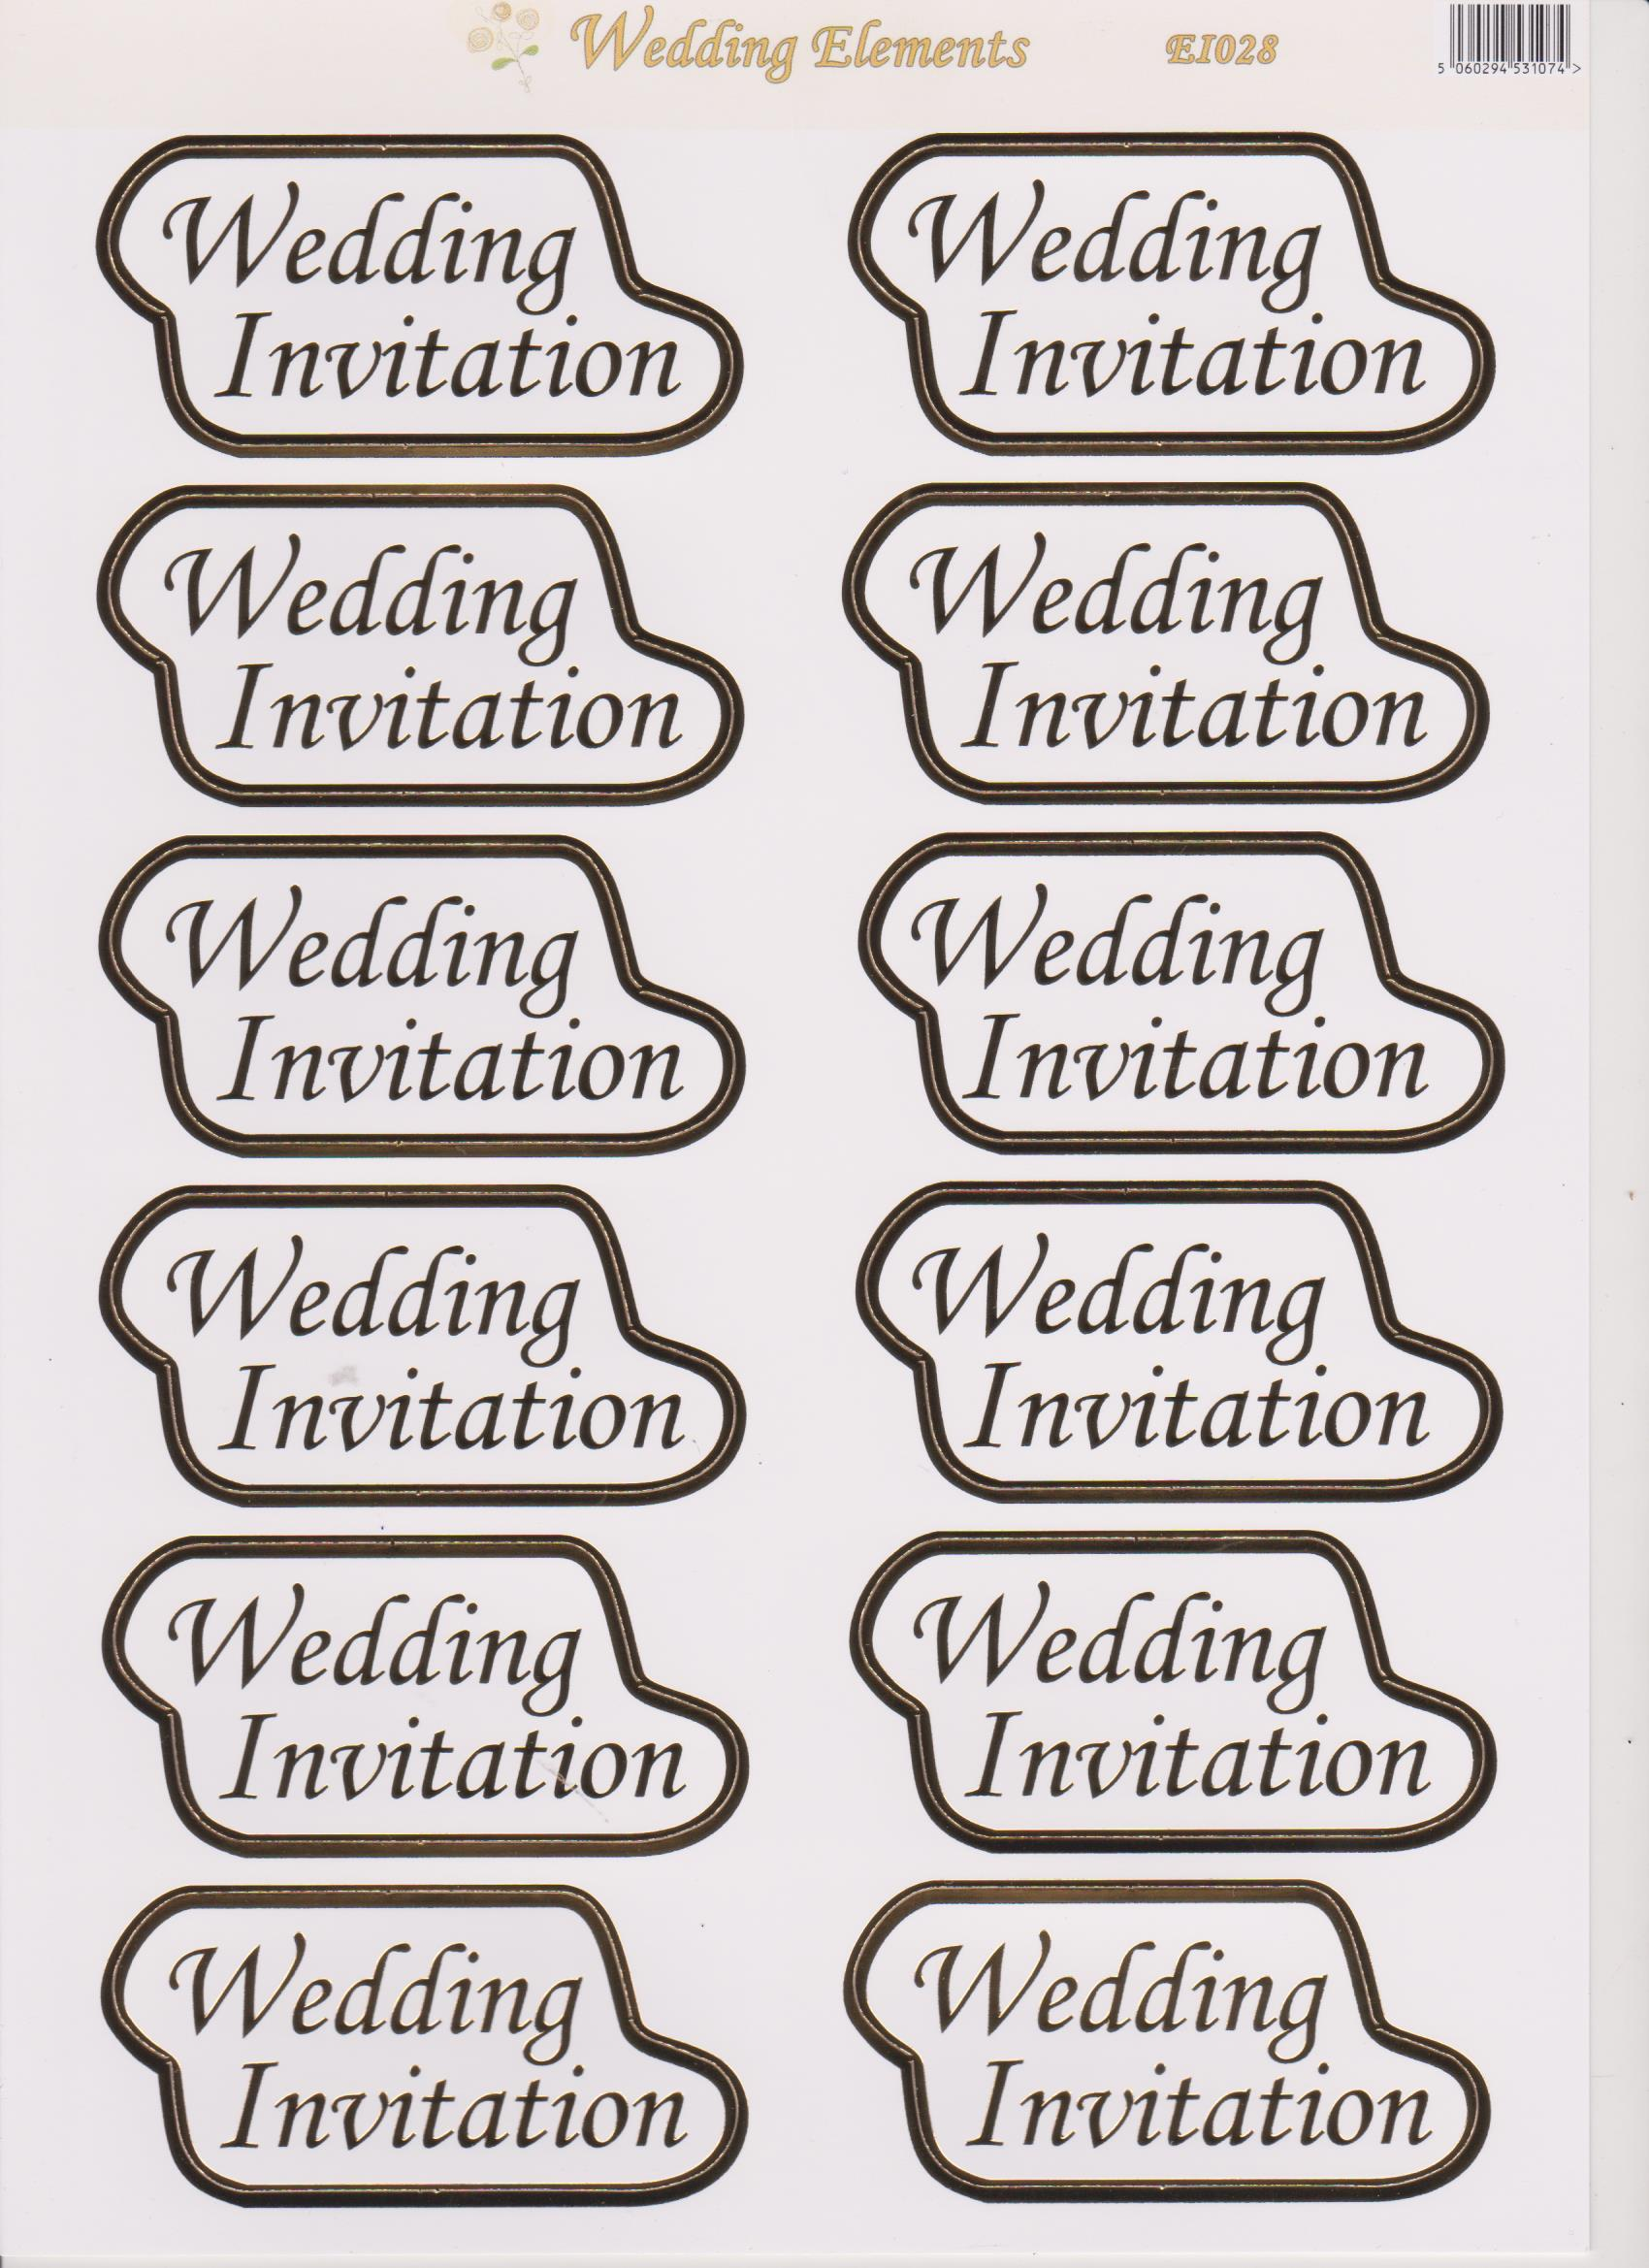 Craft Uk Limited -Wedding Elements Fancy Words   Virgo CraftsVirgo ...